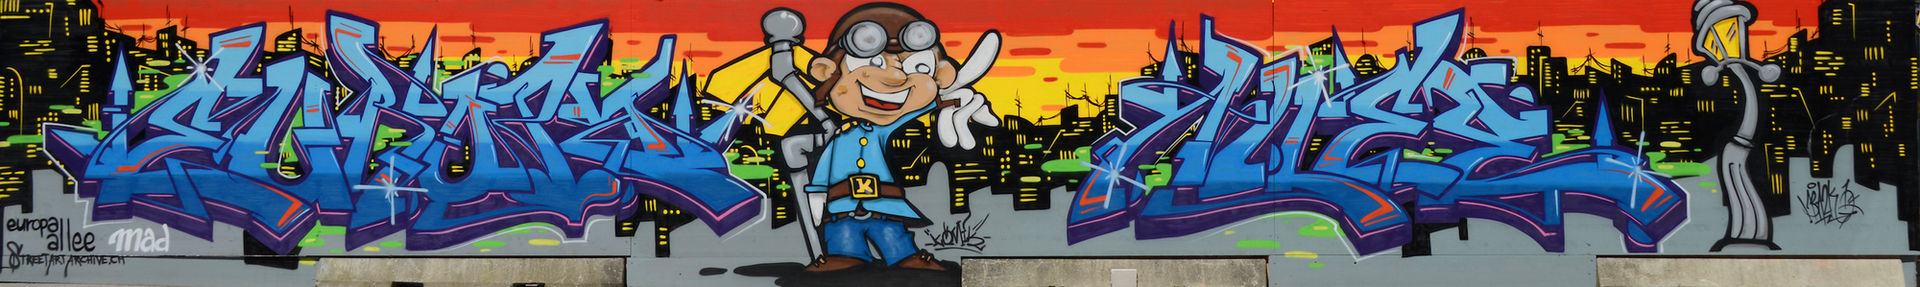 Mr.Bazk One and Komik One  Europaallee   Streetart.Limited